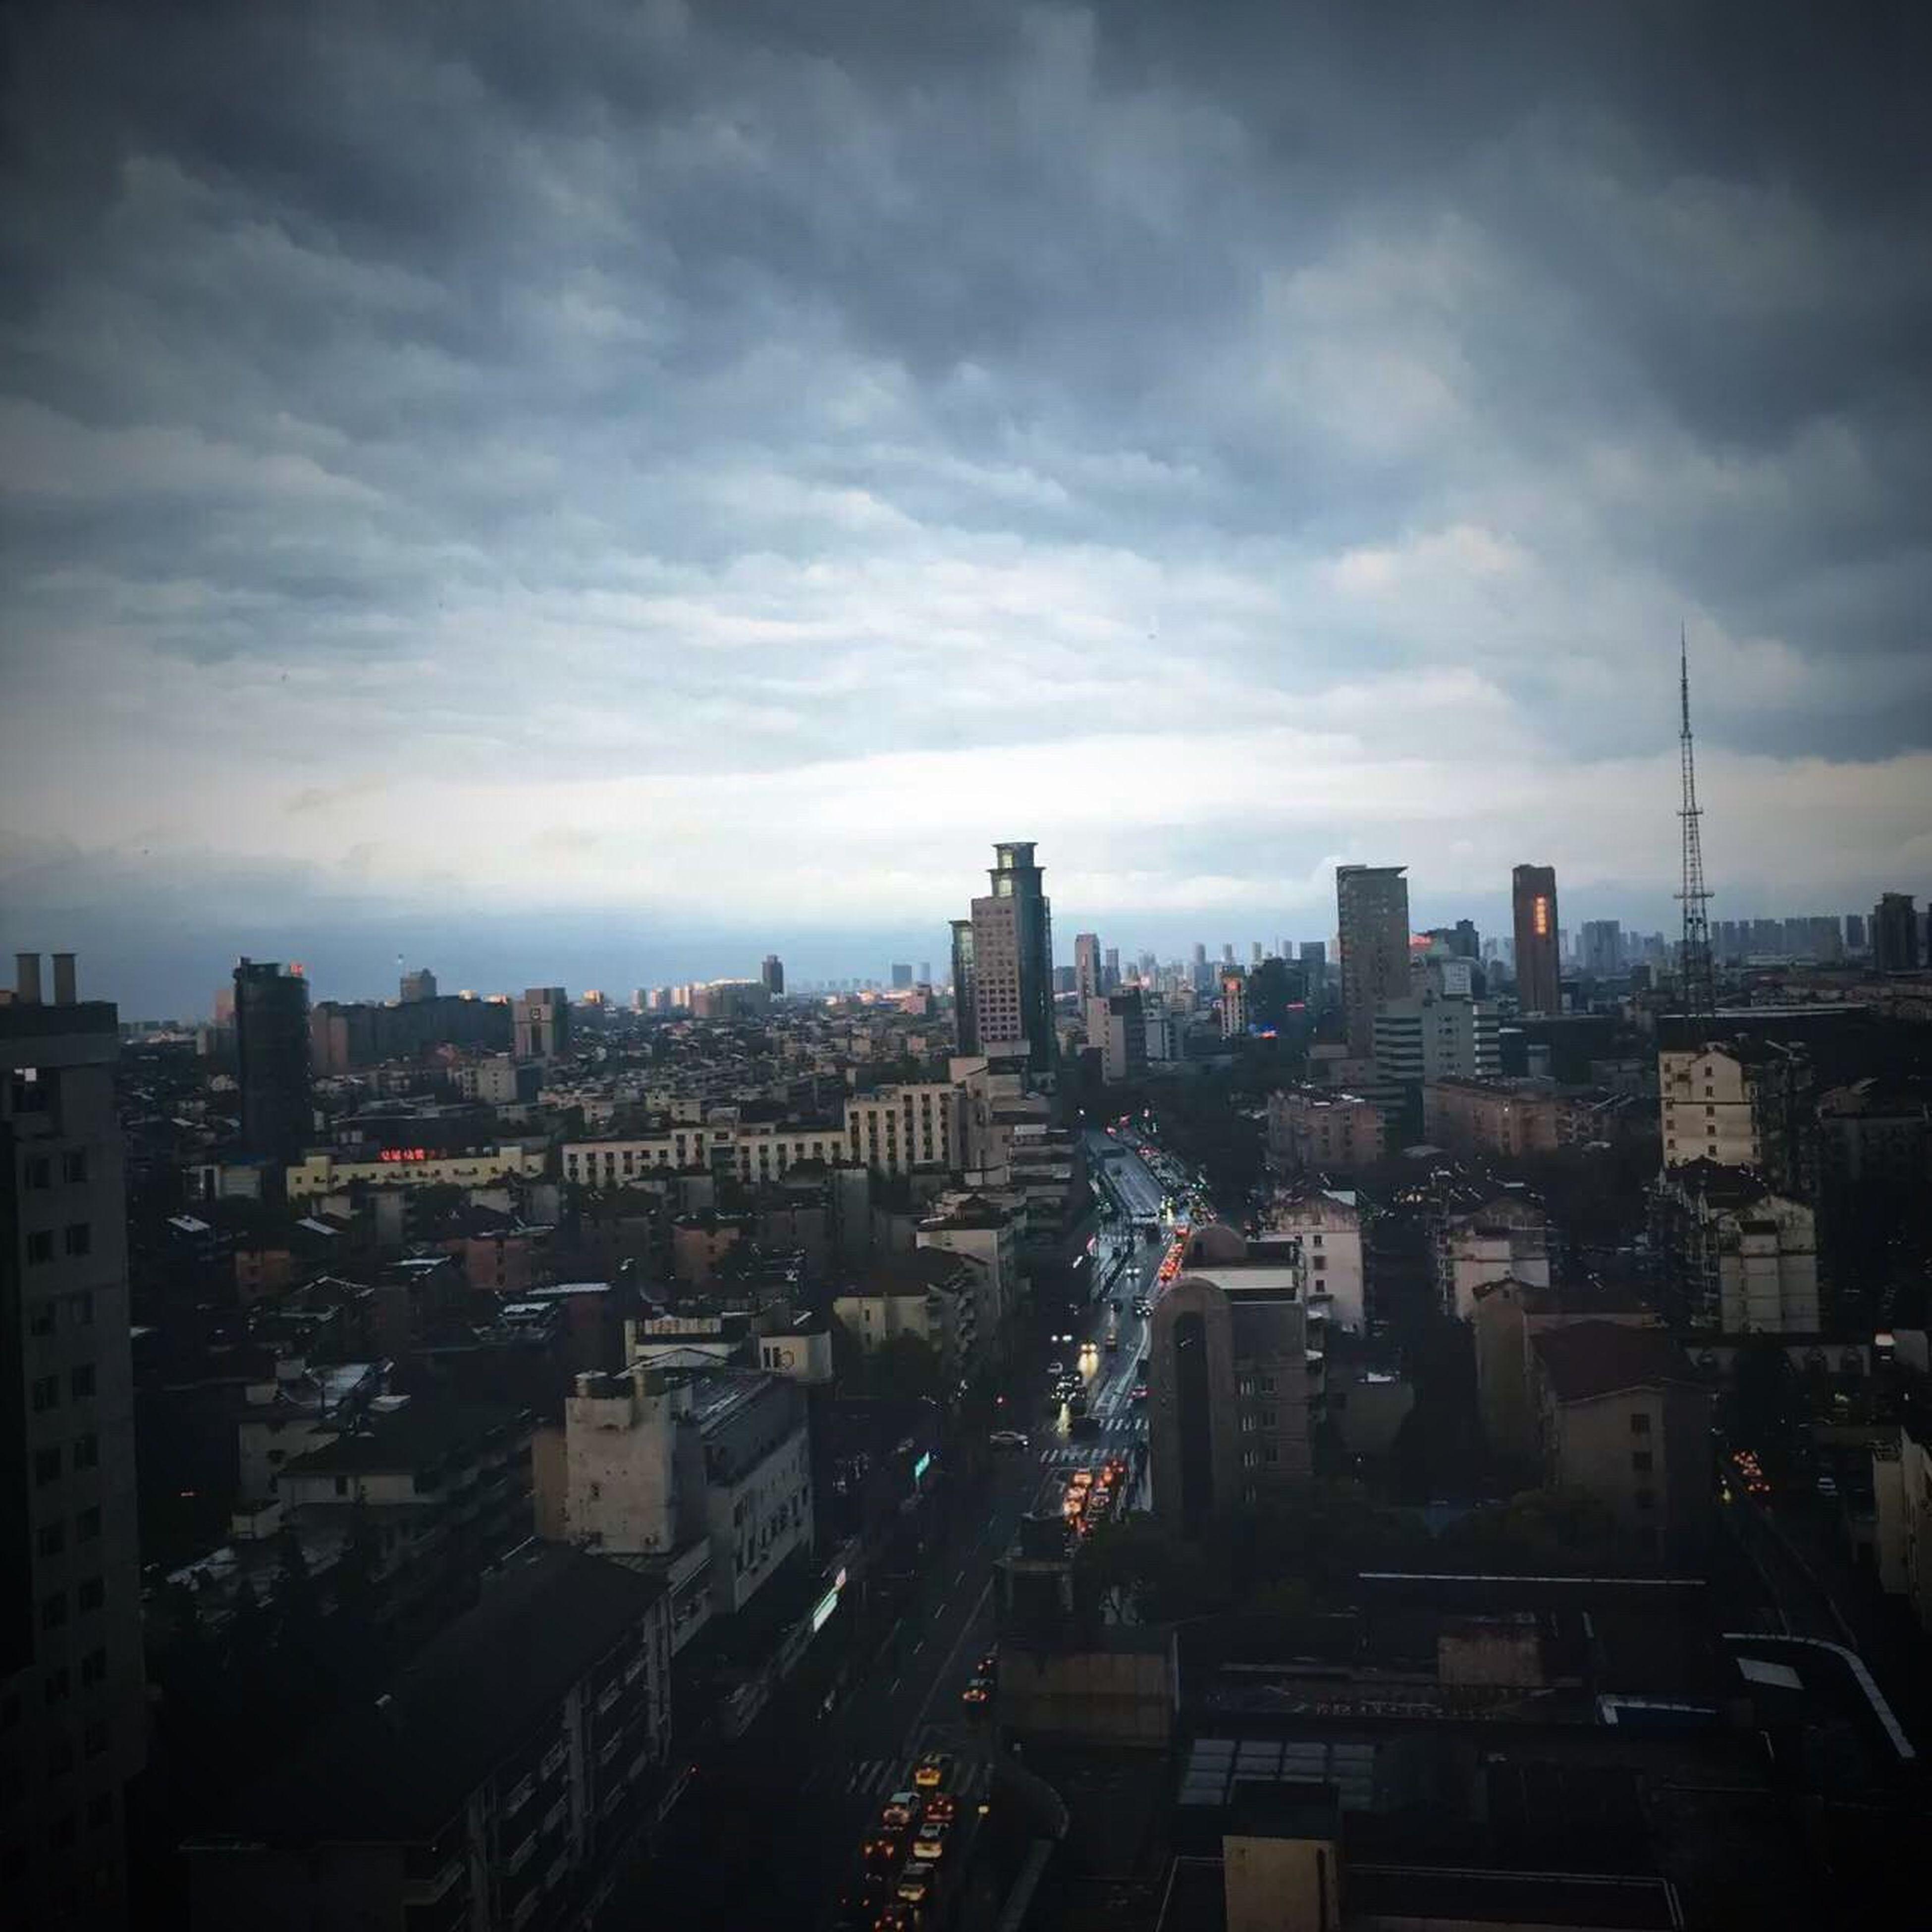 architecture, cityscape, building exterior, city, built structure, skyscraper, sky, no people, cloud - sky, travel destinations, outdoors, day